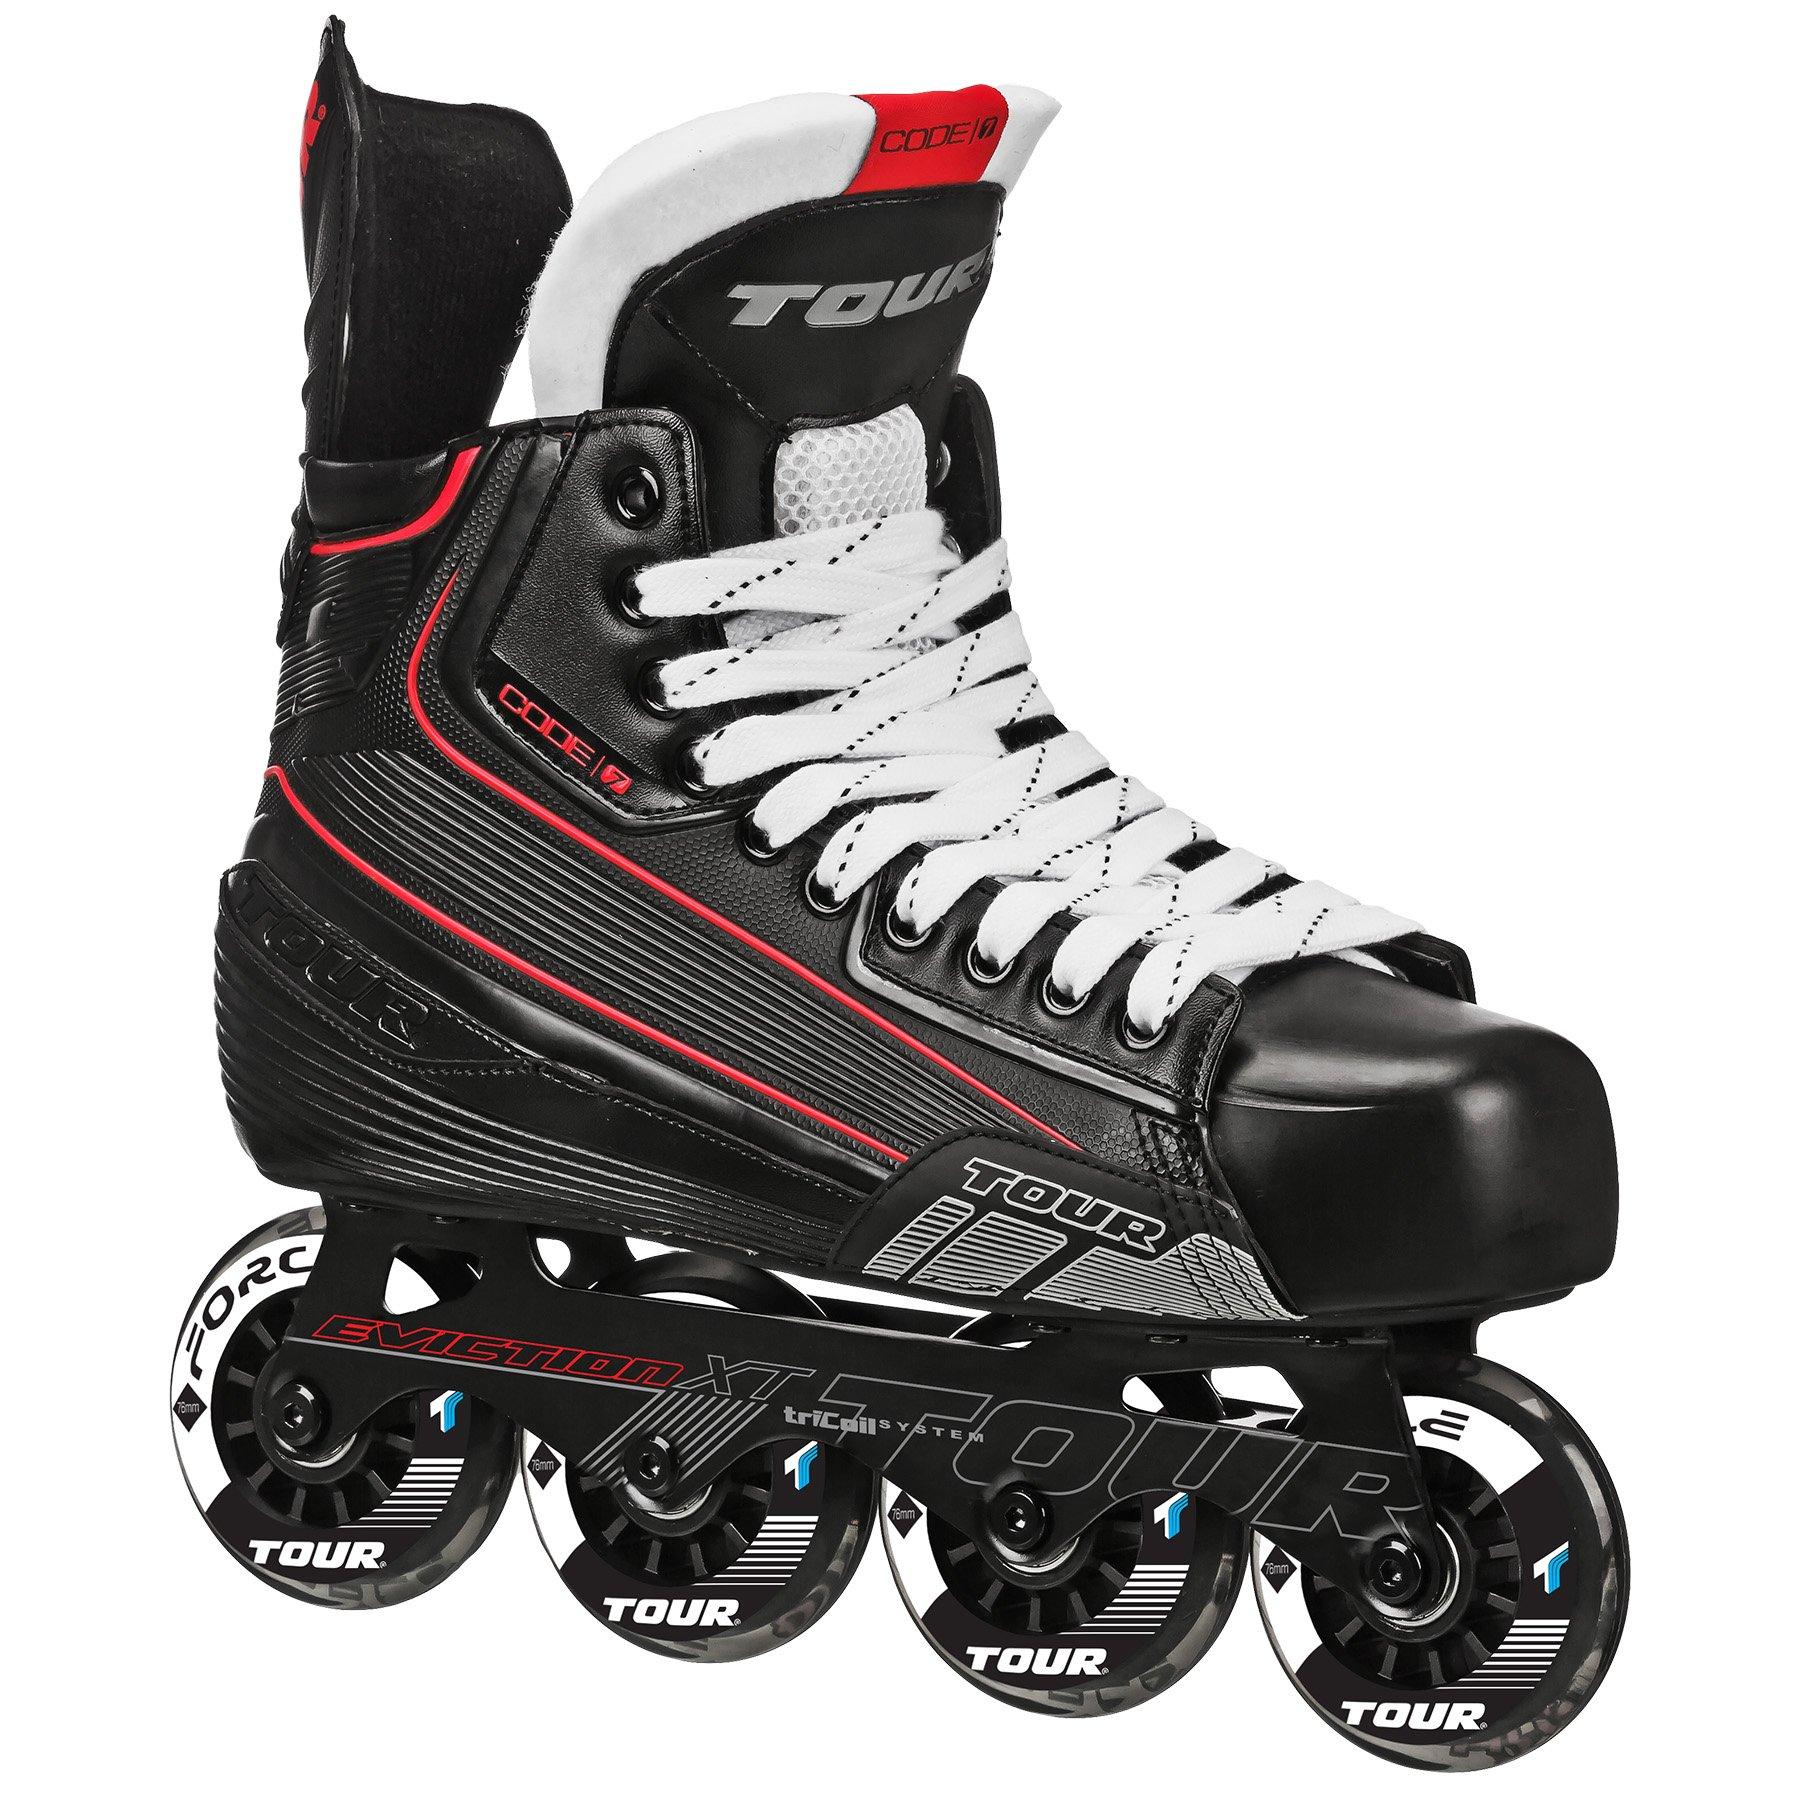 TOUR Hockey CODE 7 Senior Inline Hockey Skate, Black, 12 by Tour Hockey